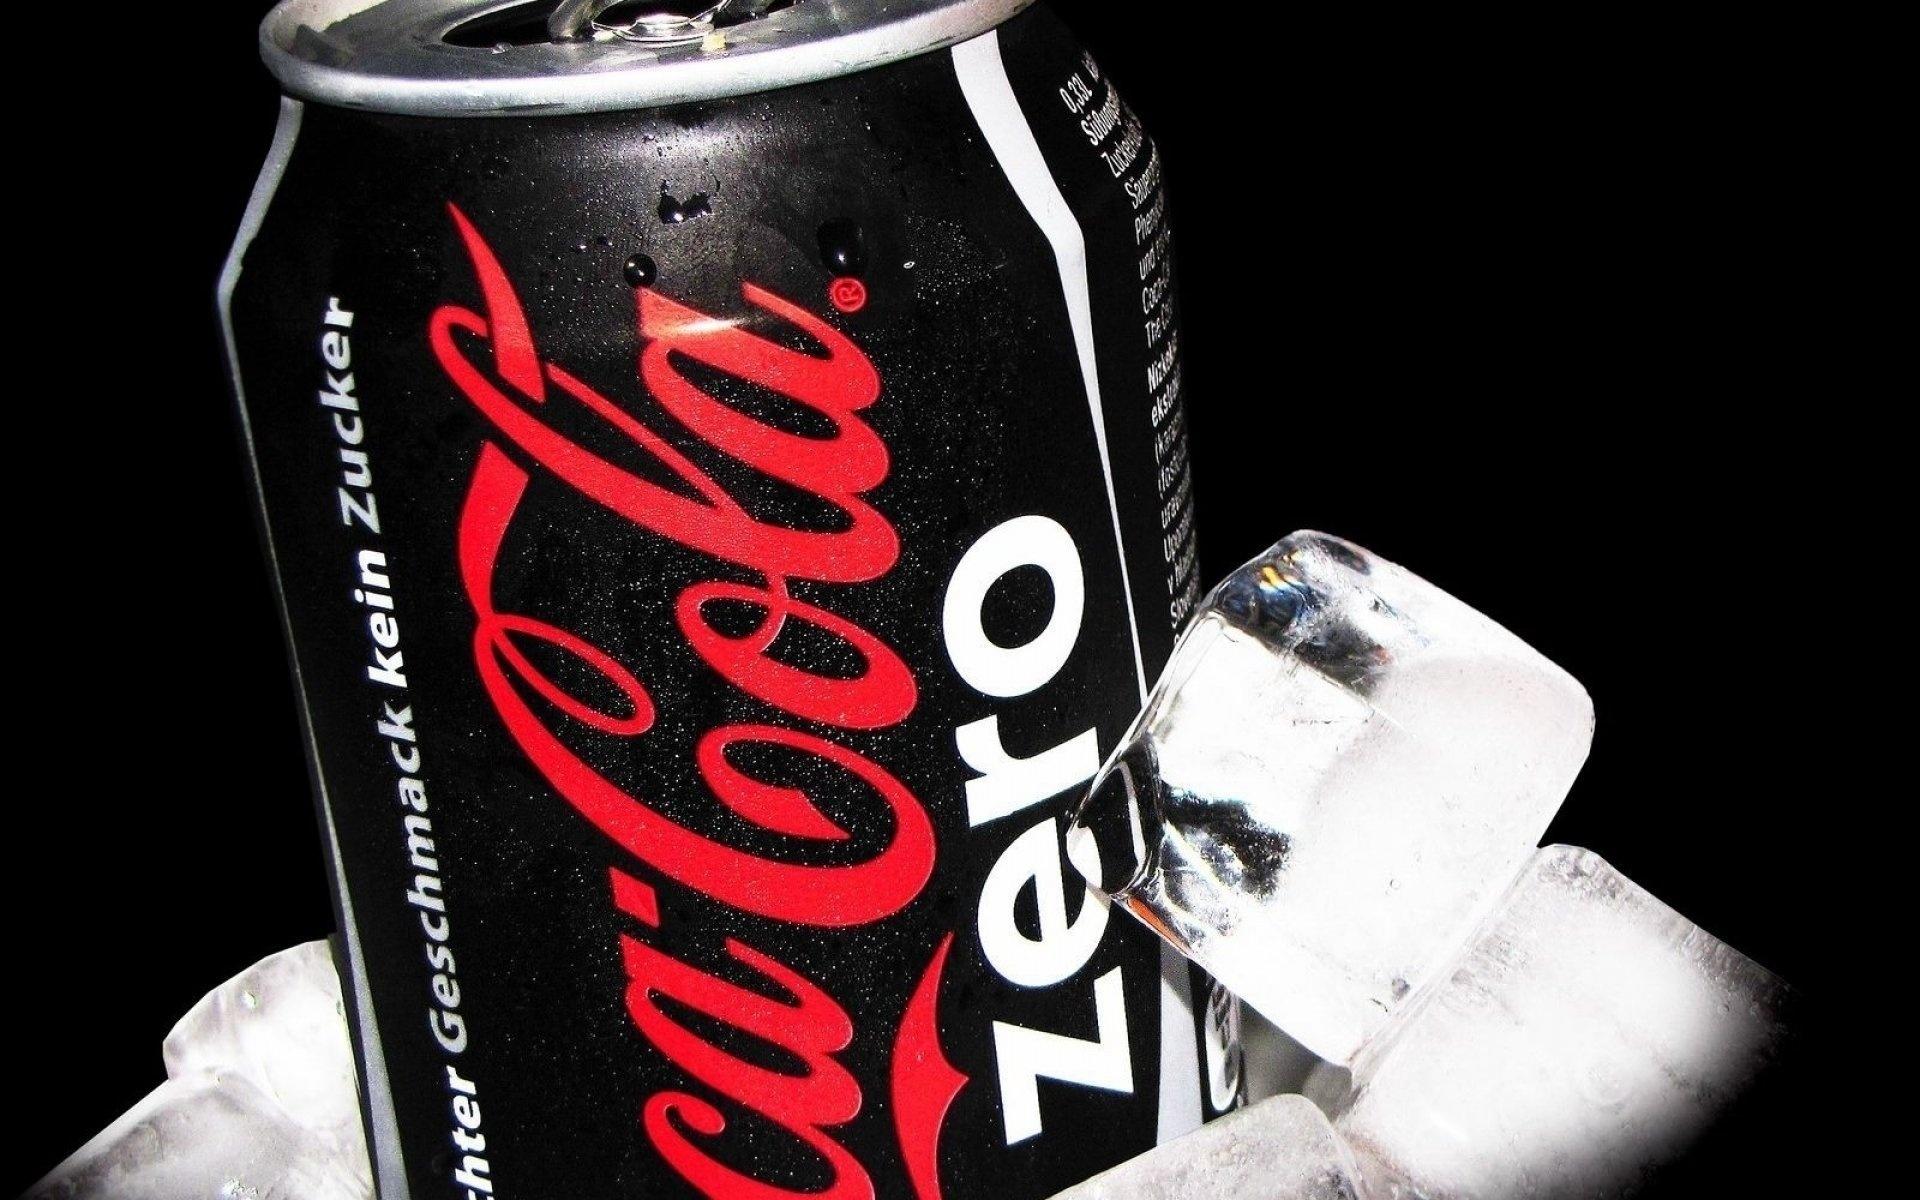 Hintergrundbilder : Eis, Coca Cola, Bank, Null, Alkoholfreies ...